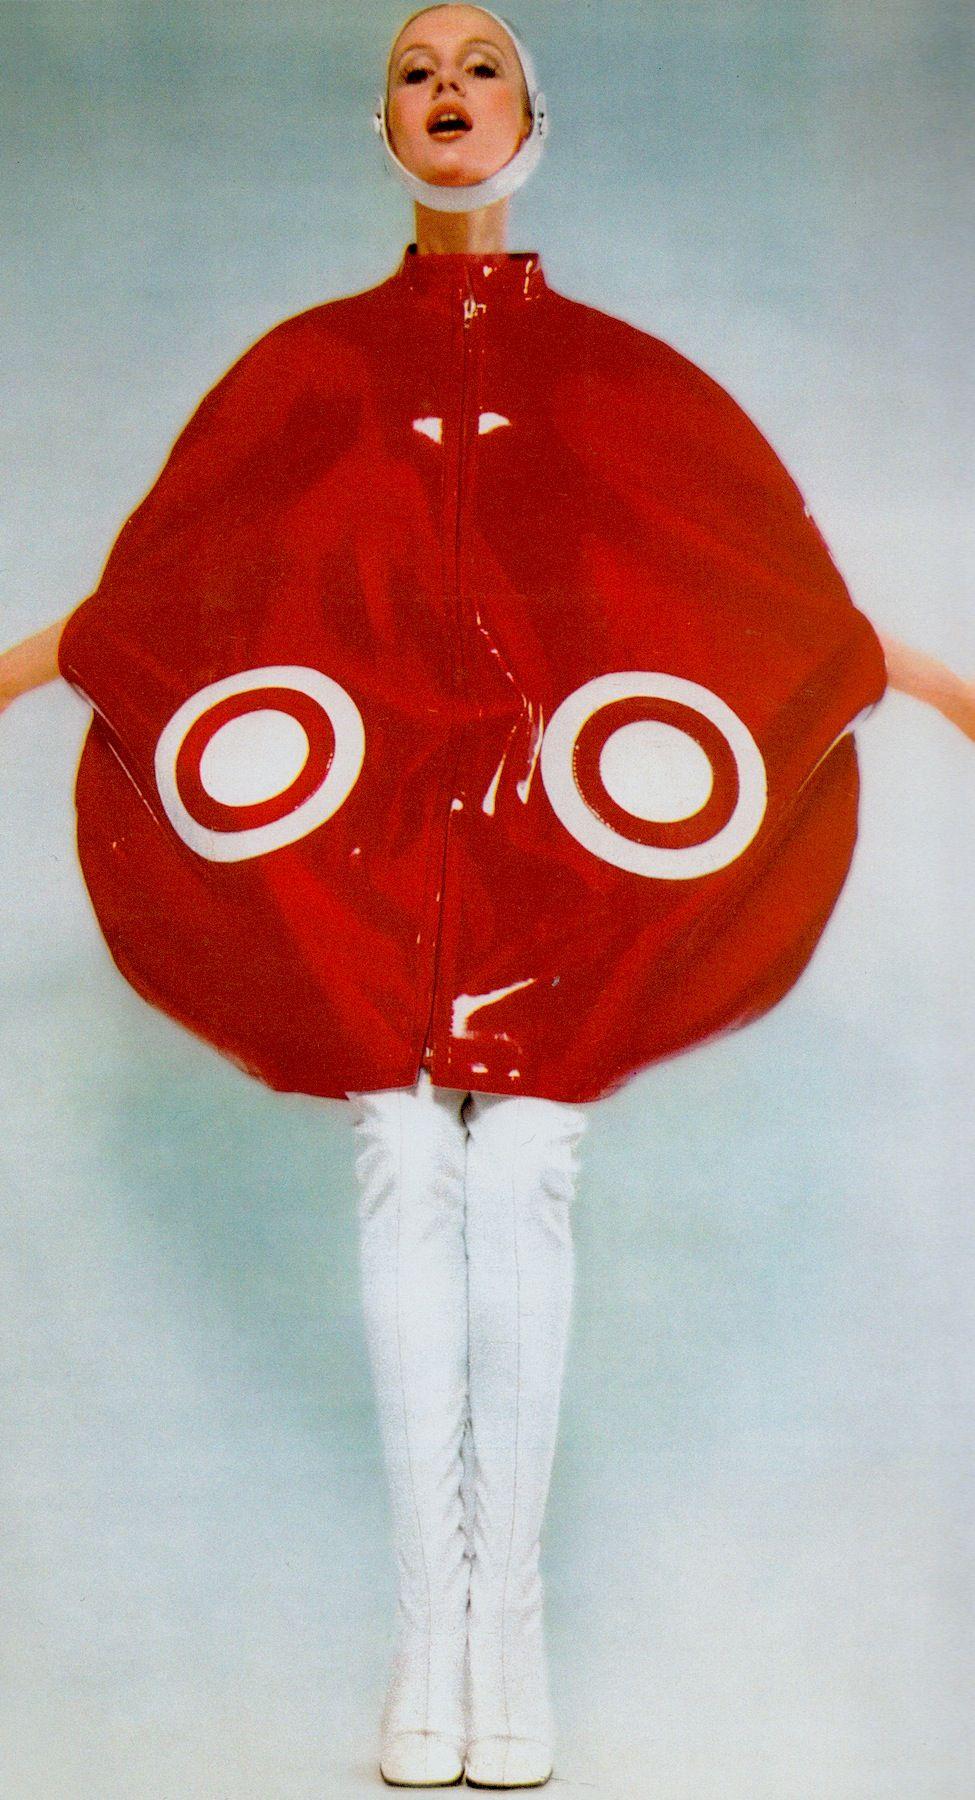 Lou Lou wearing Cardin's red plastic ball ensemble 1969 jαɢlαdy